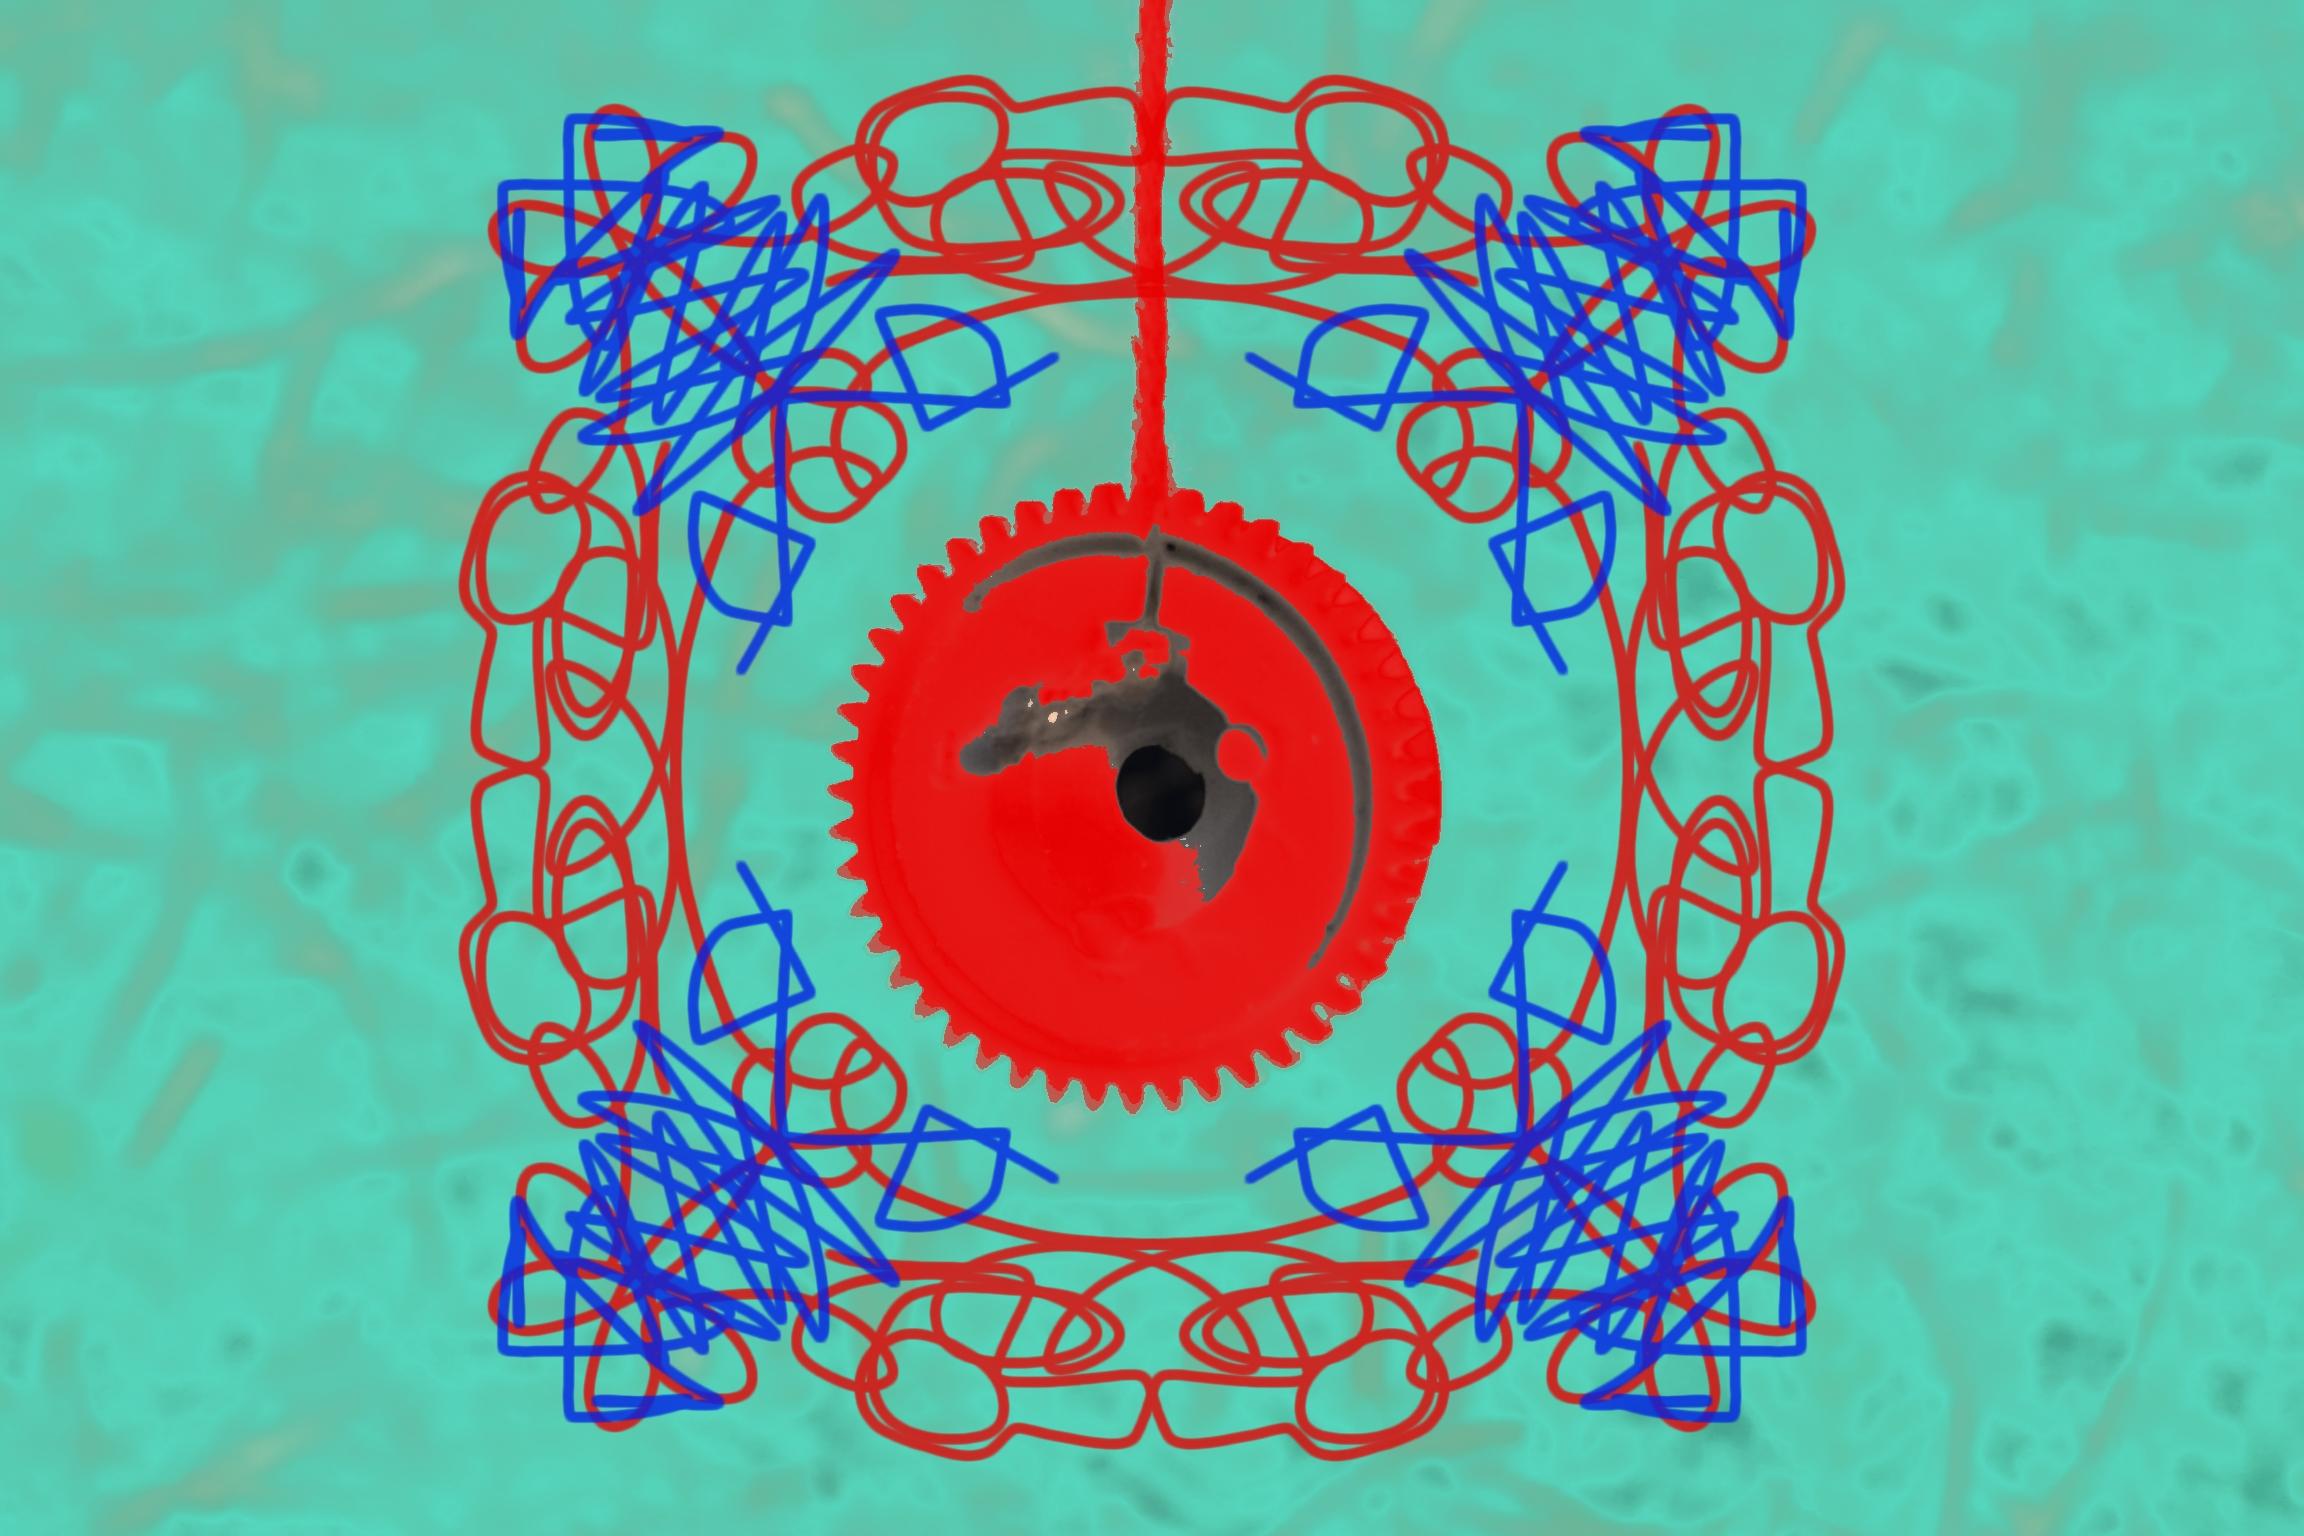 Mechanism illustration